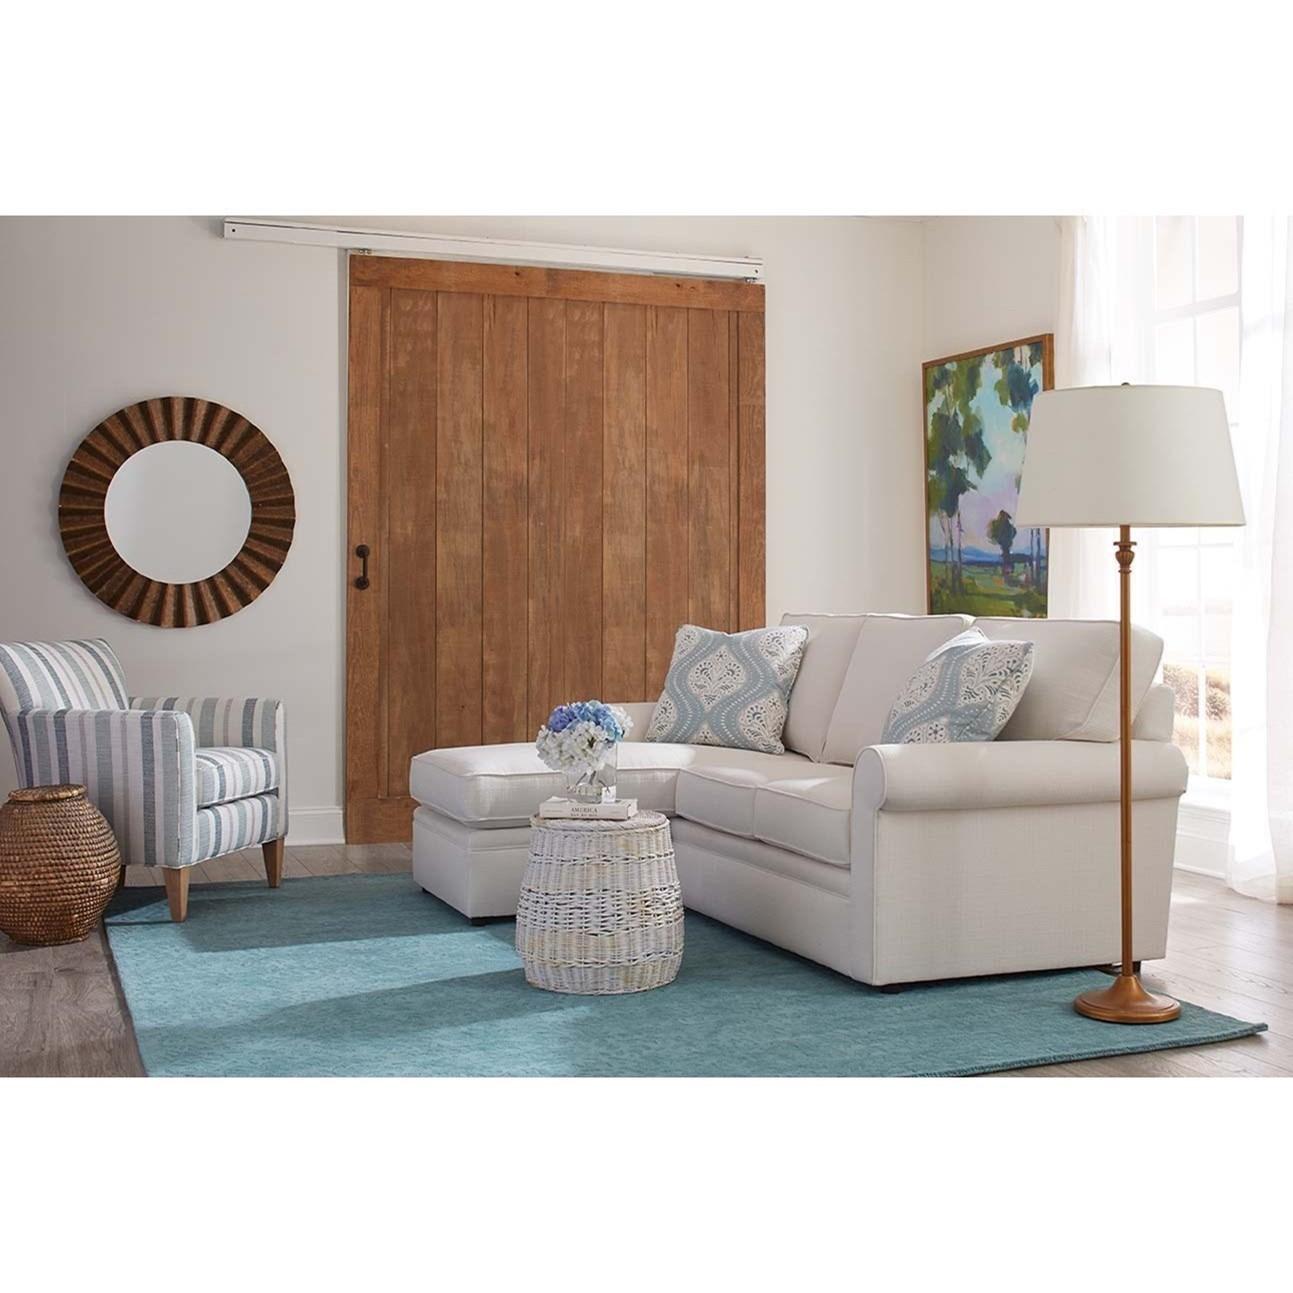 Dalton Sofa with Storage Chaise by Rowe at Bullard Furniture